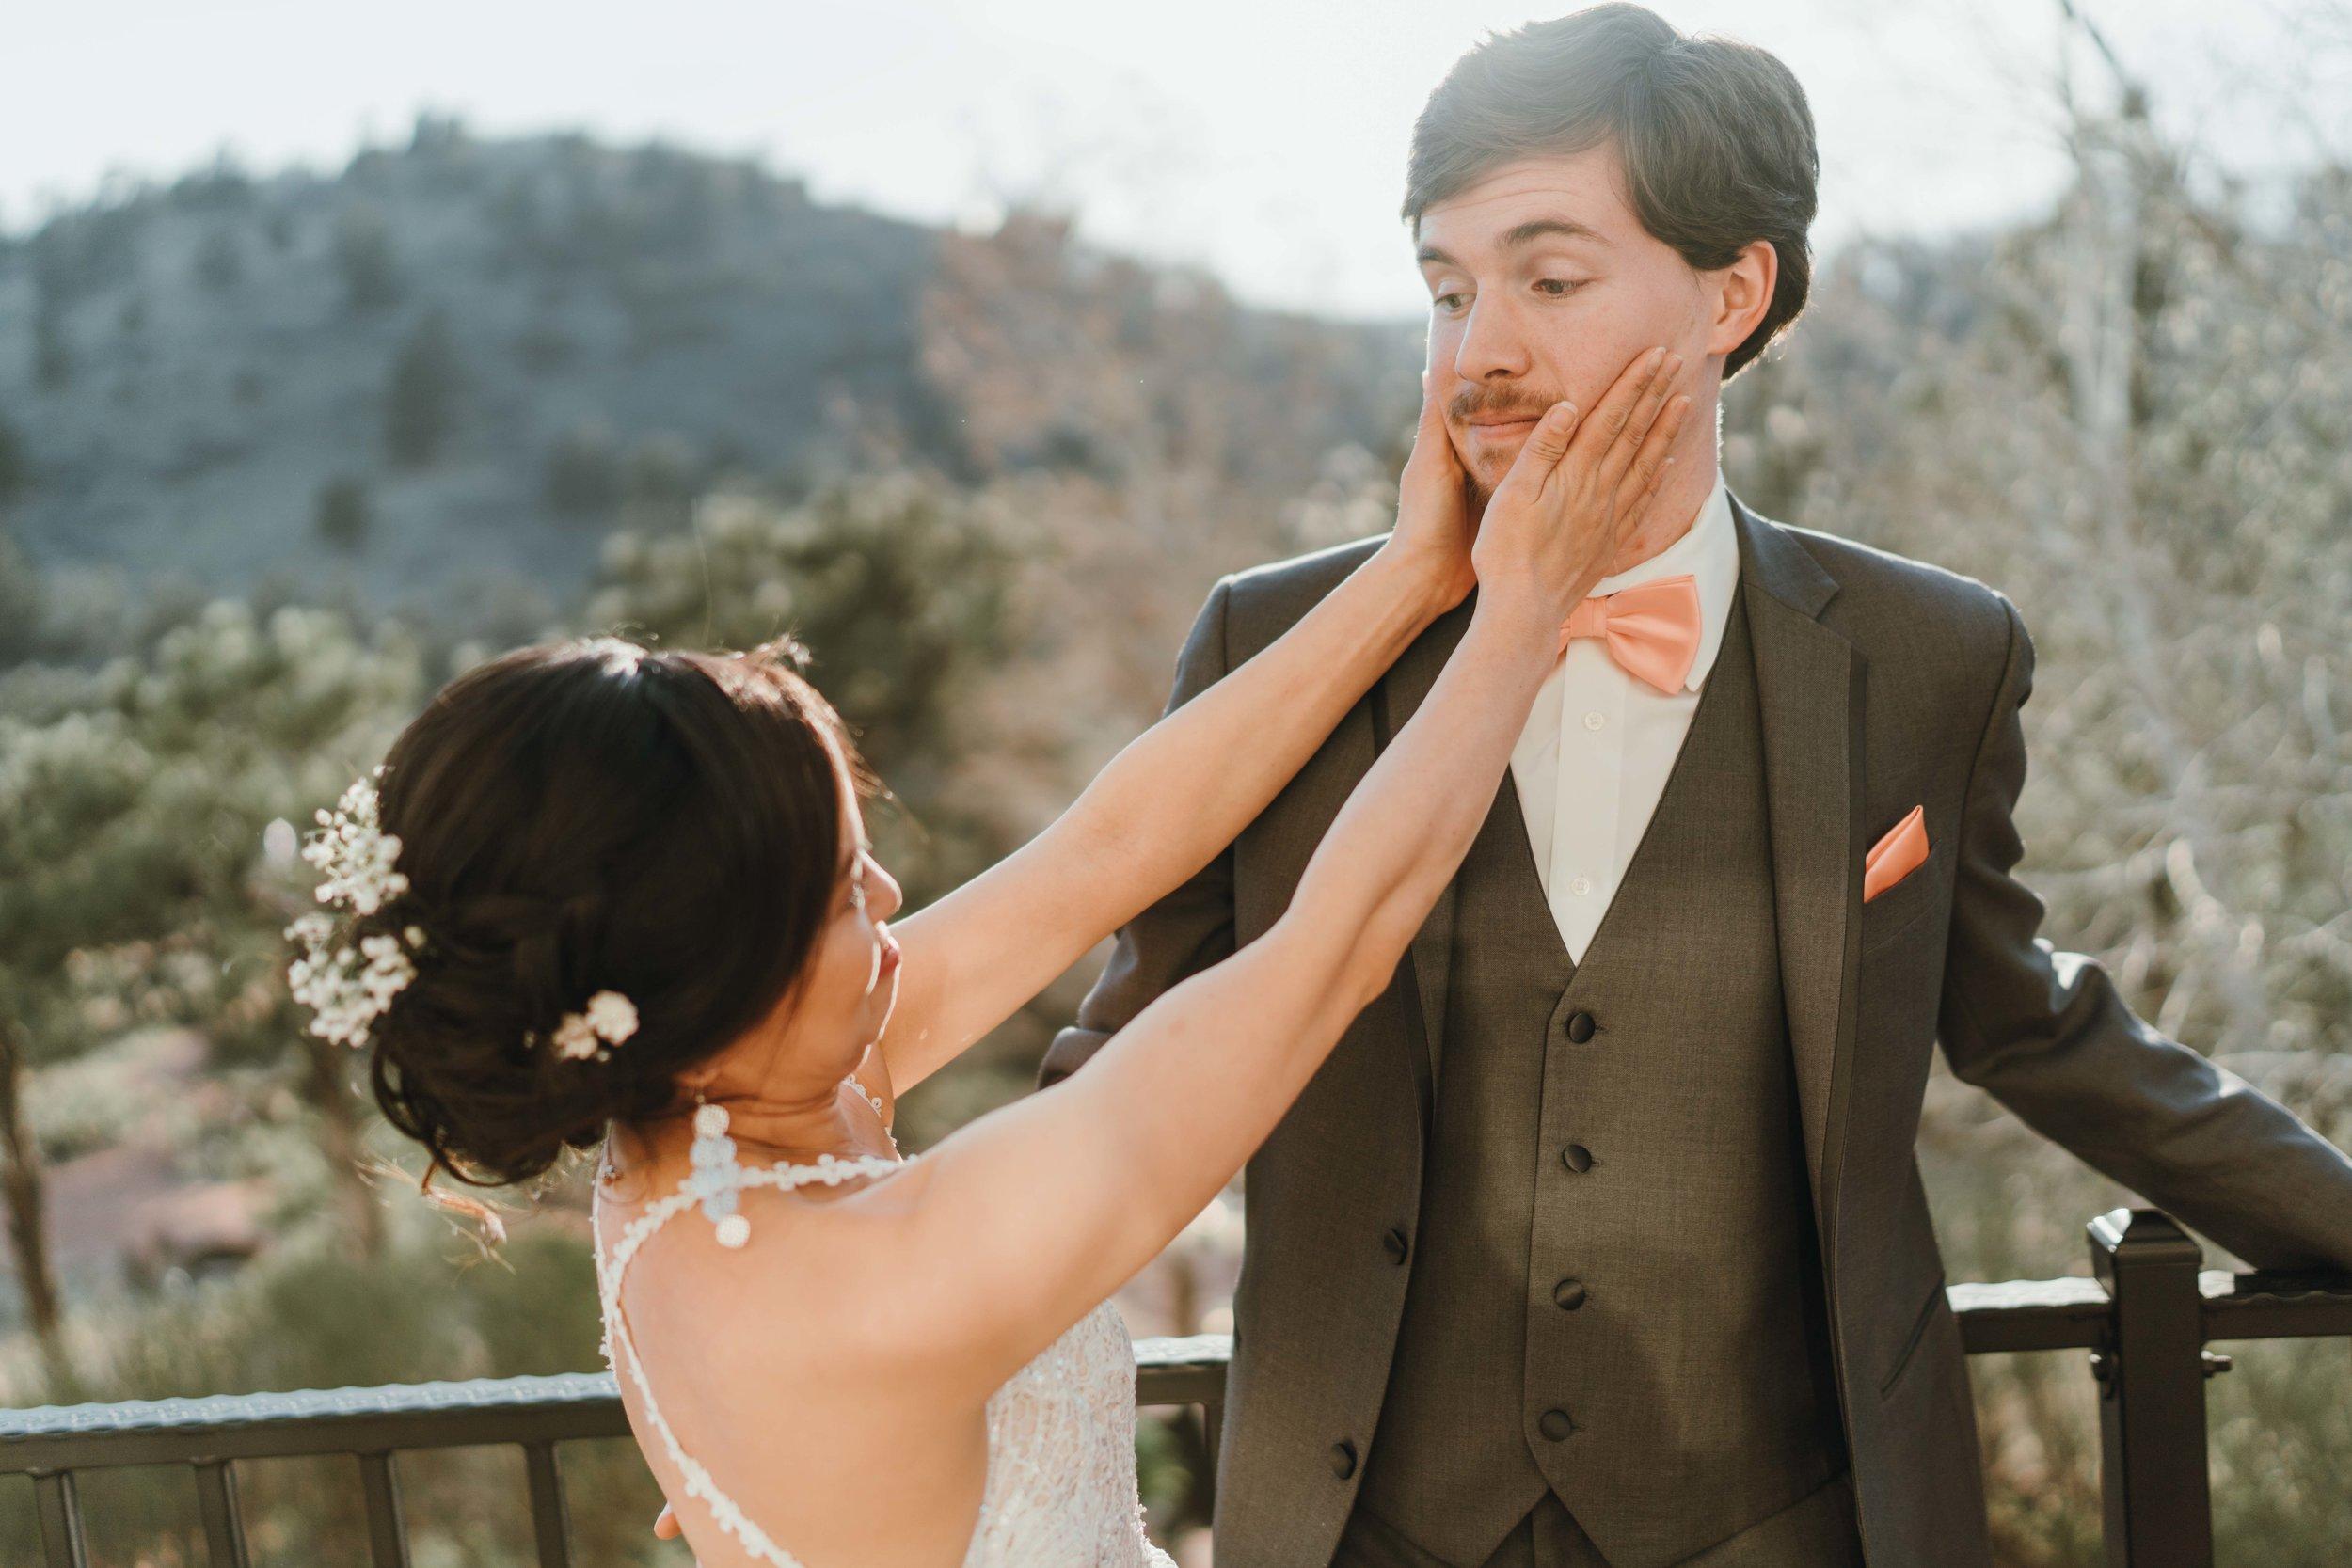 denver wedding photographer lioncrest manor in lyons ben and mali -DSC06420.jpg